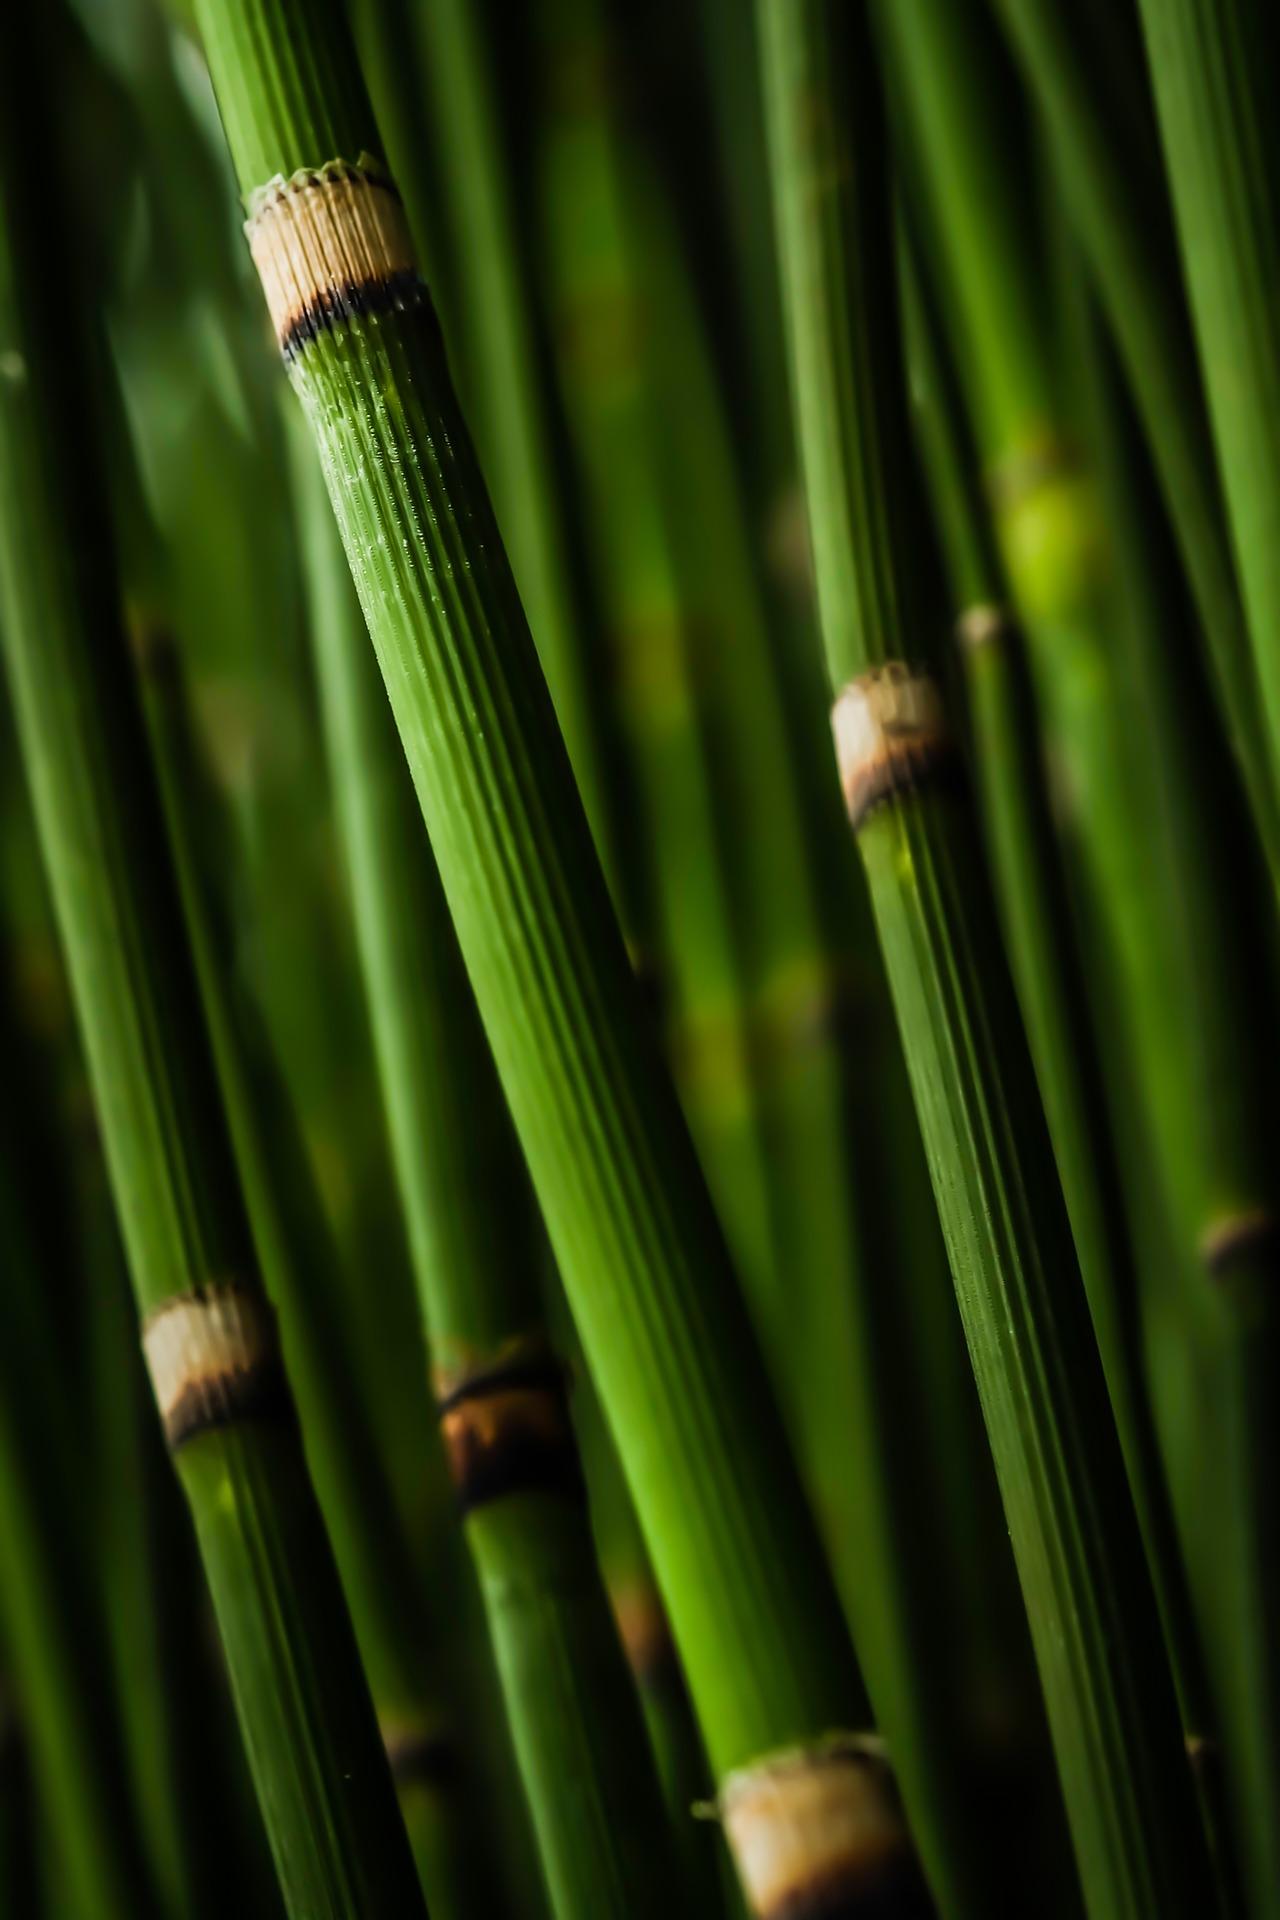 bamboo-984548_1920